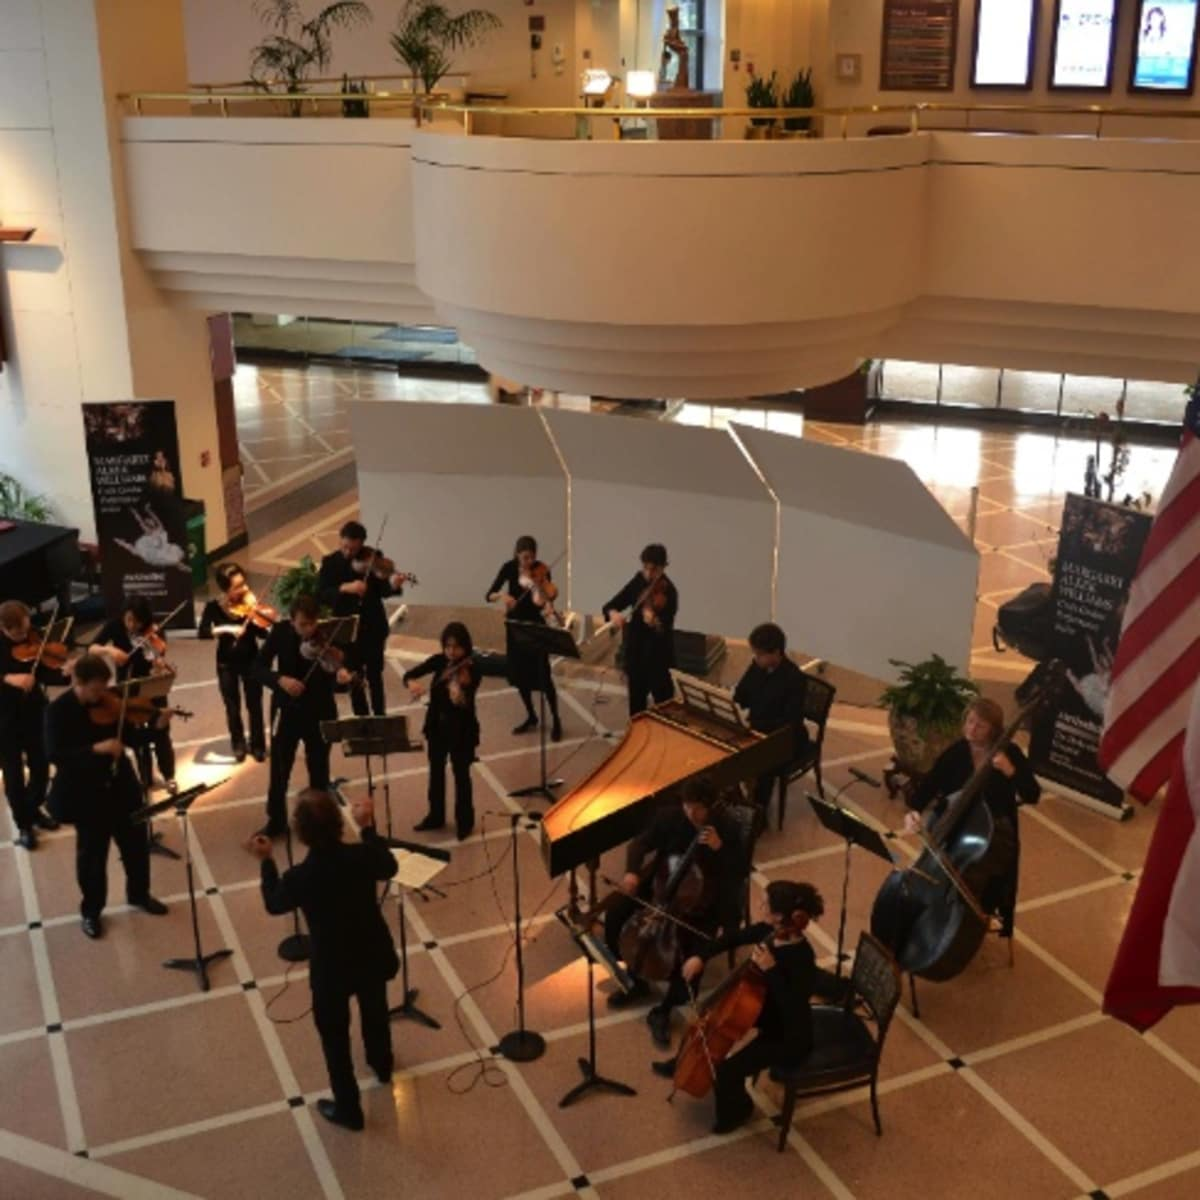 Margaret Alkek Williams Crain Garden Performance Series at Houston Methodist Hospital presents Mercury - The Orchestra Redefined